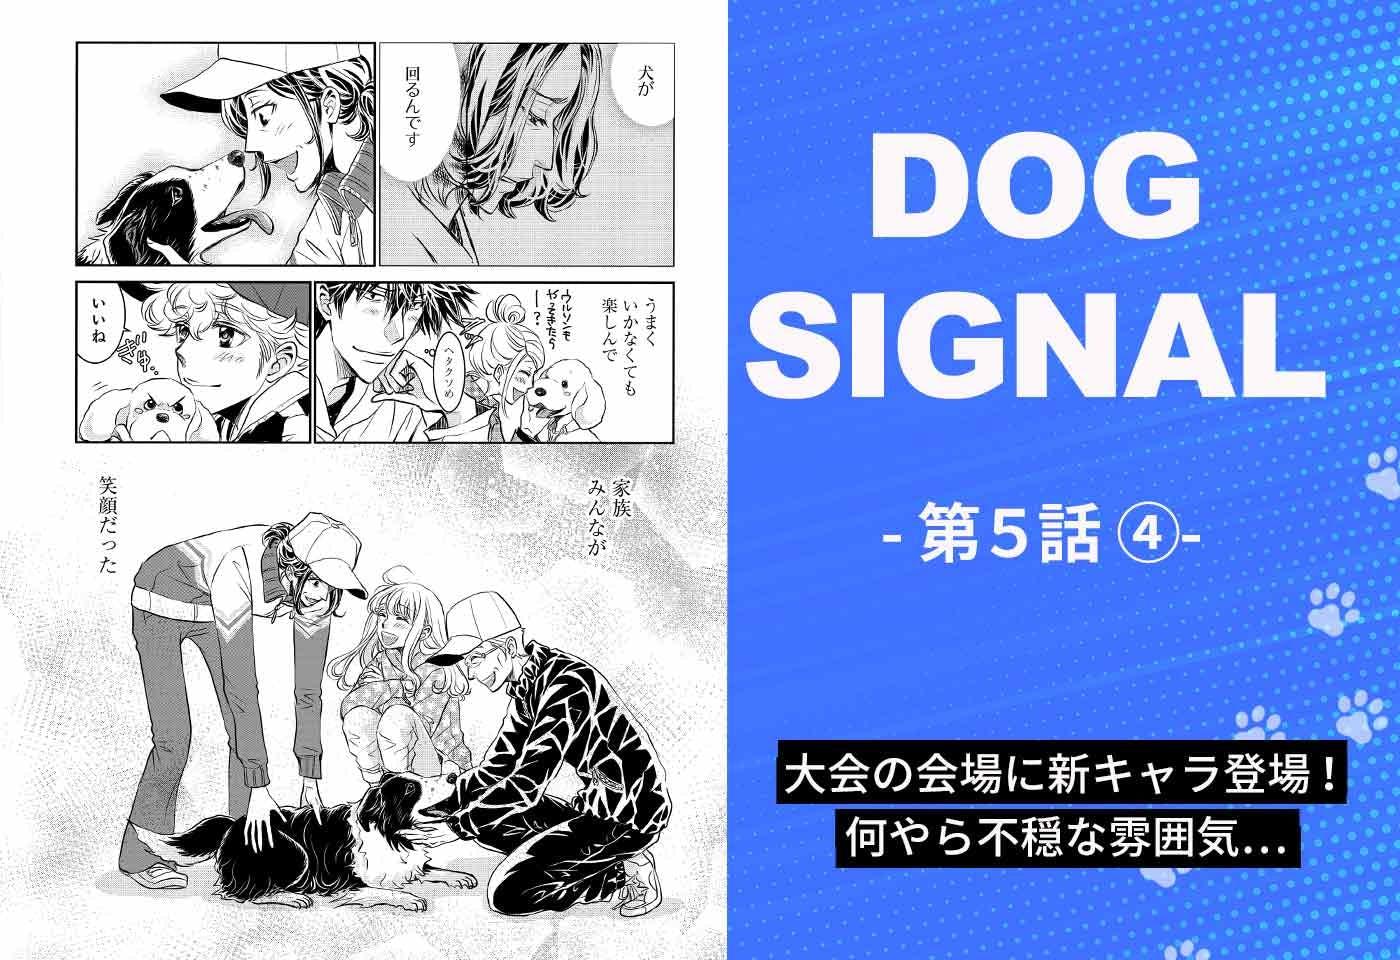 『DOG SIGNAL』5話目 4/4